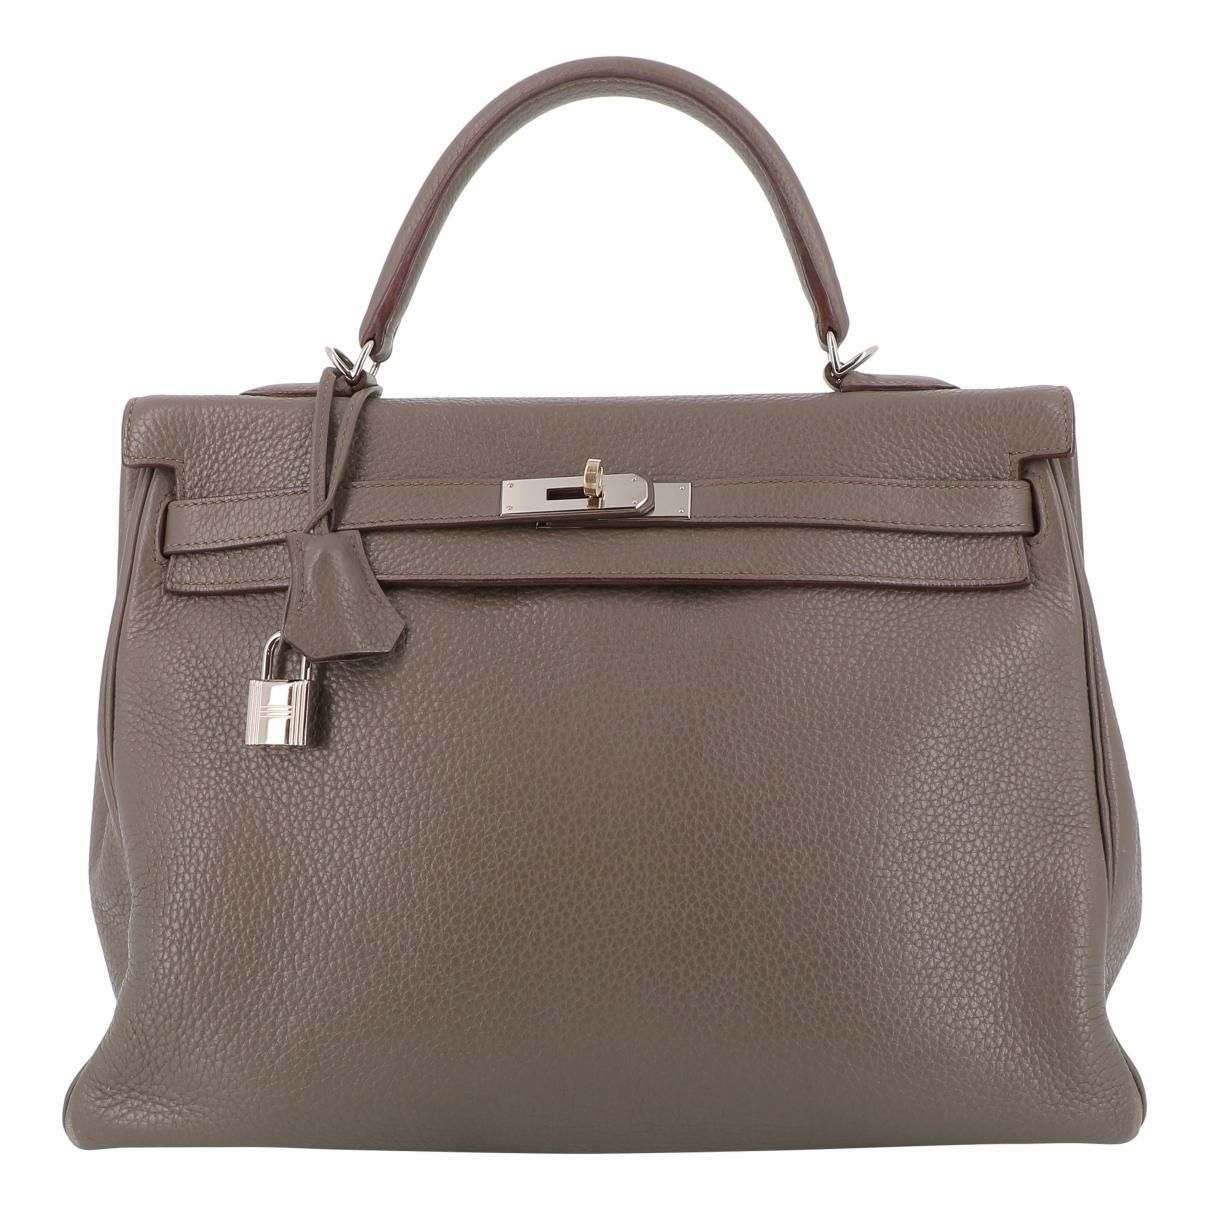 Hermes Kelly 35 Handtasche in  Braun Leder